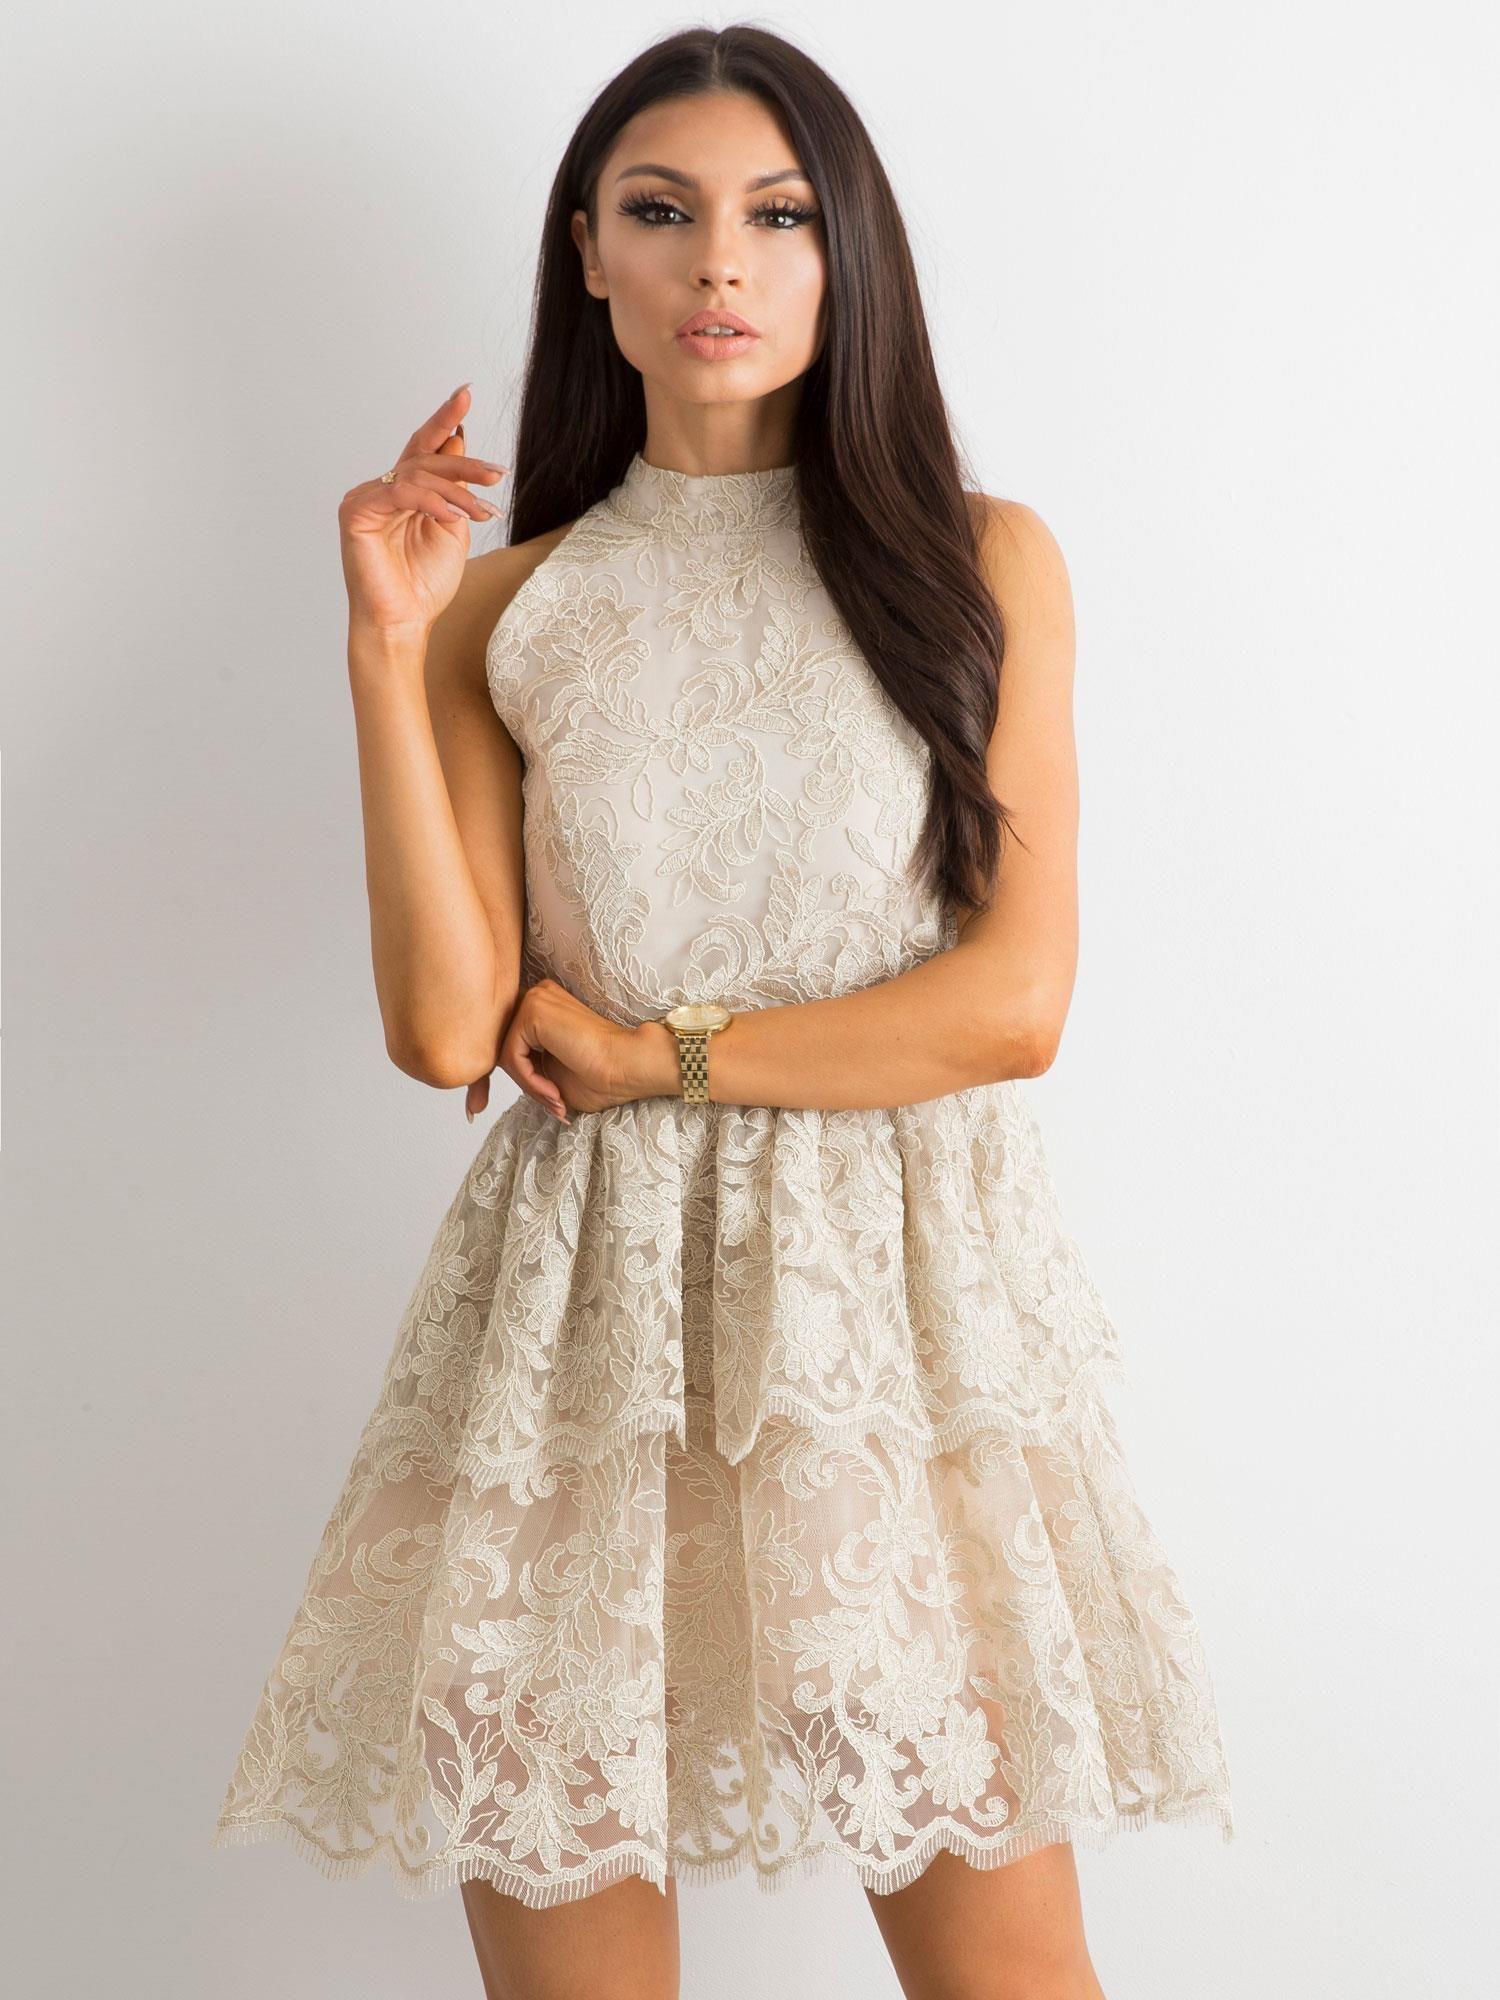 007d3a1a72 BY O LA LA Beżowa koronkowa sukienka z falbanami - Sukienka ...